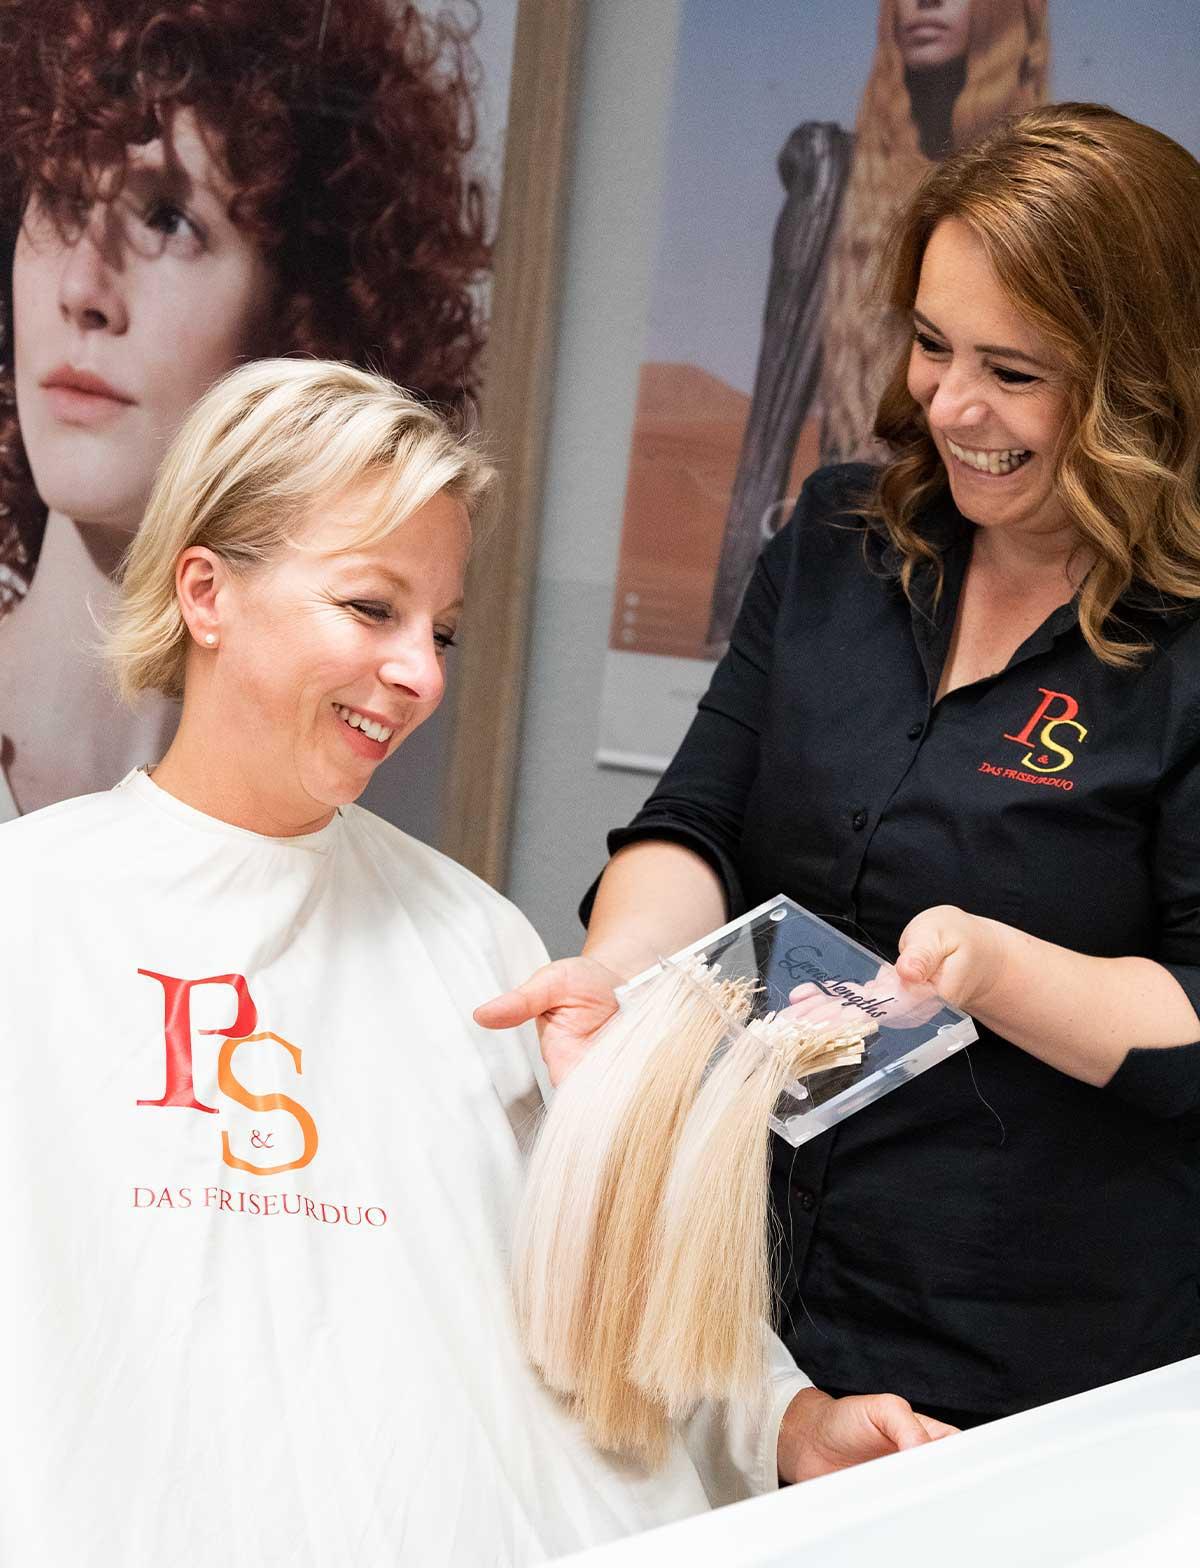 P&S Das Friseurduo - Beratung Haarverlängerung